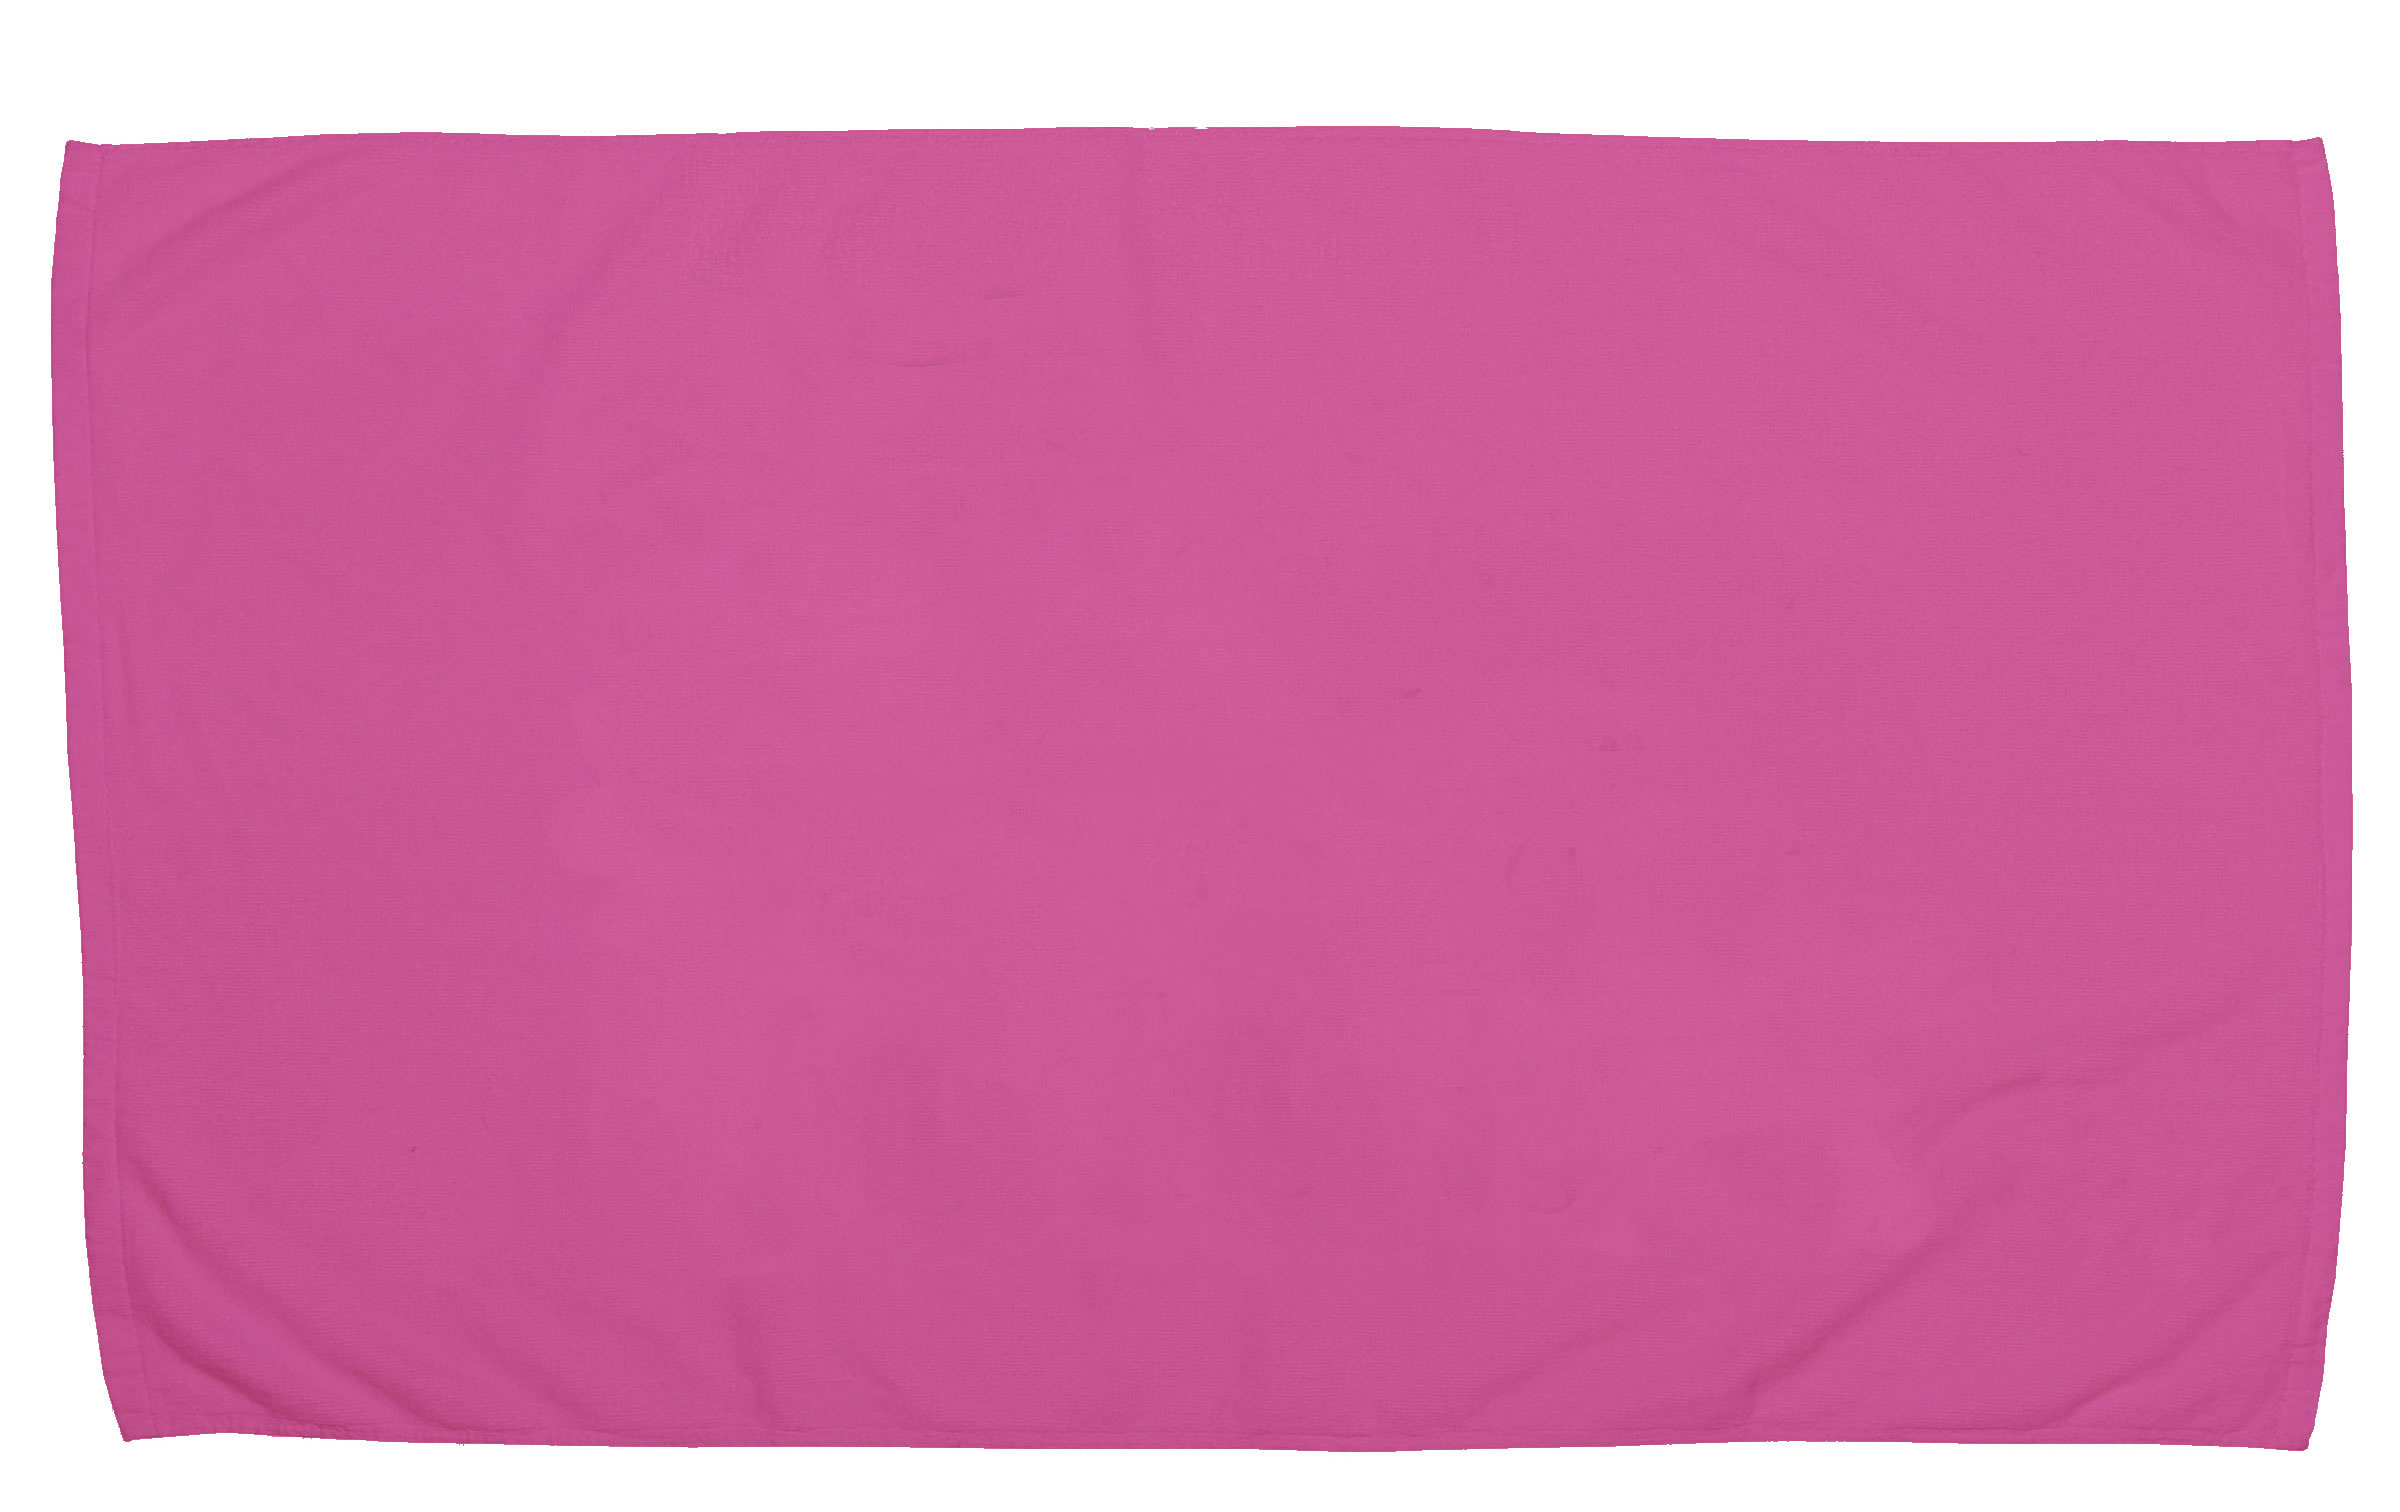 2442-Pink